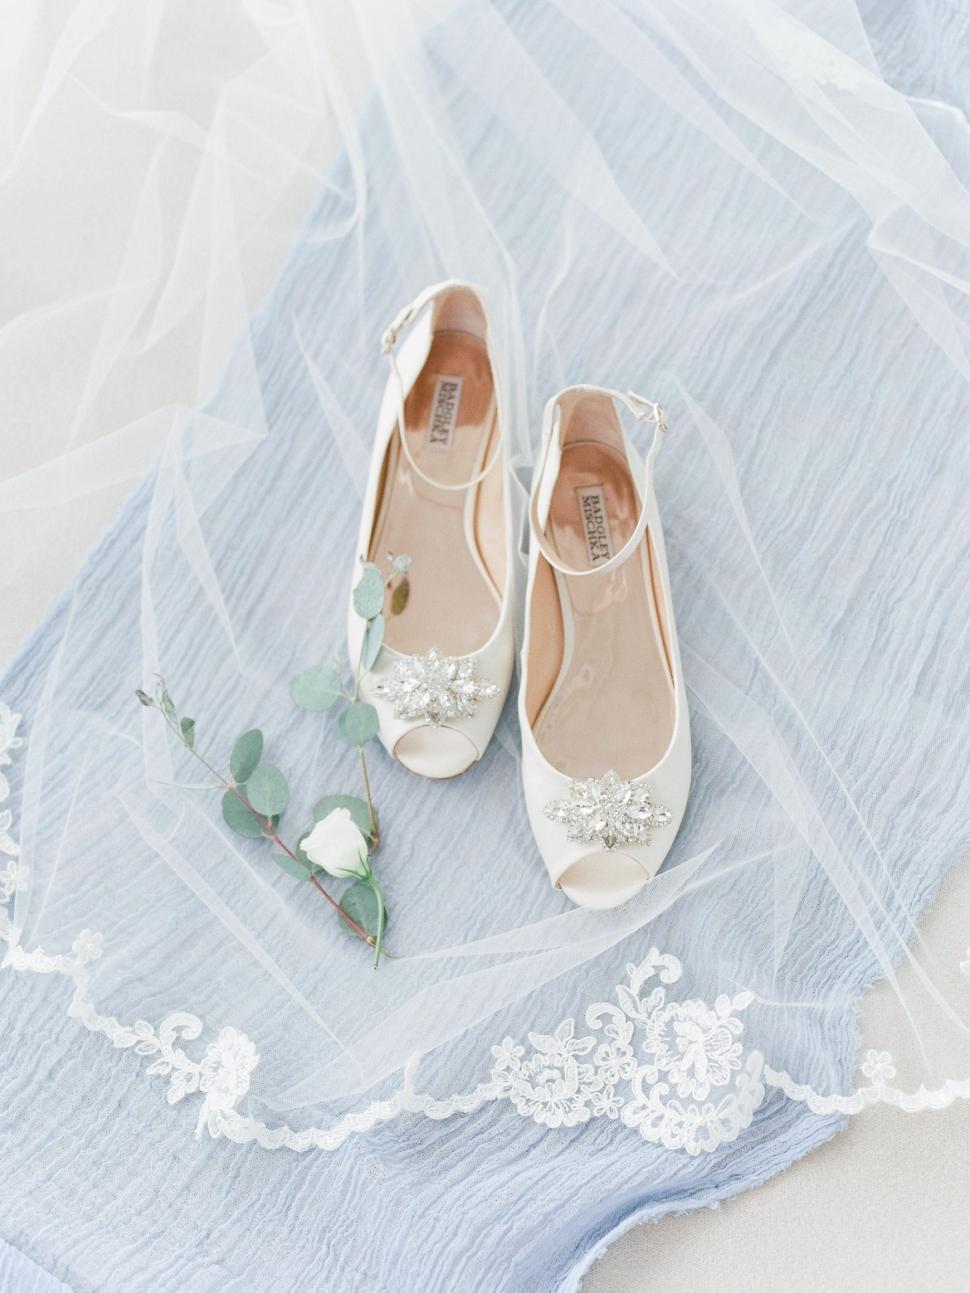 Ryland-Inn-Wedding-Photographer-Cassi-Claire_Ryland-Inn-Wedding_12.jpg